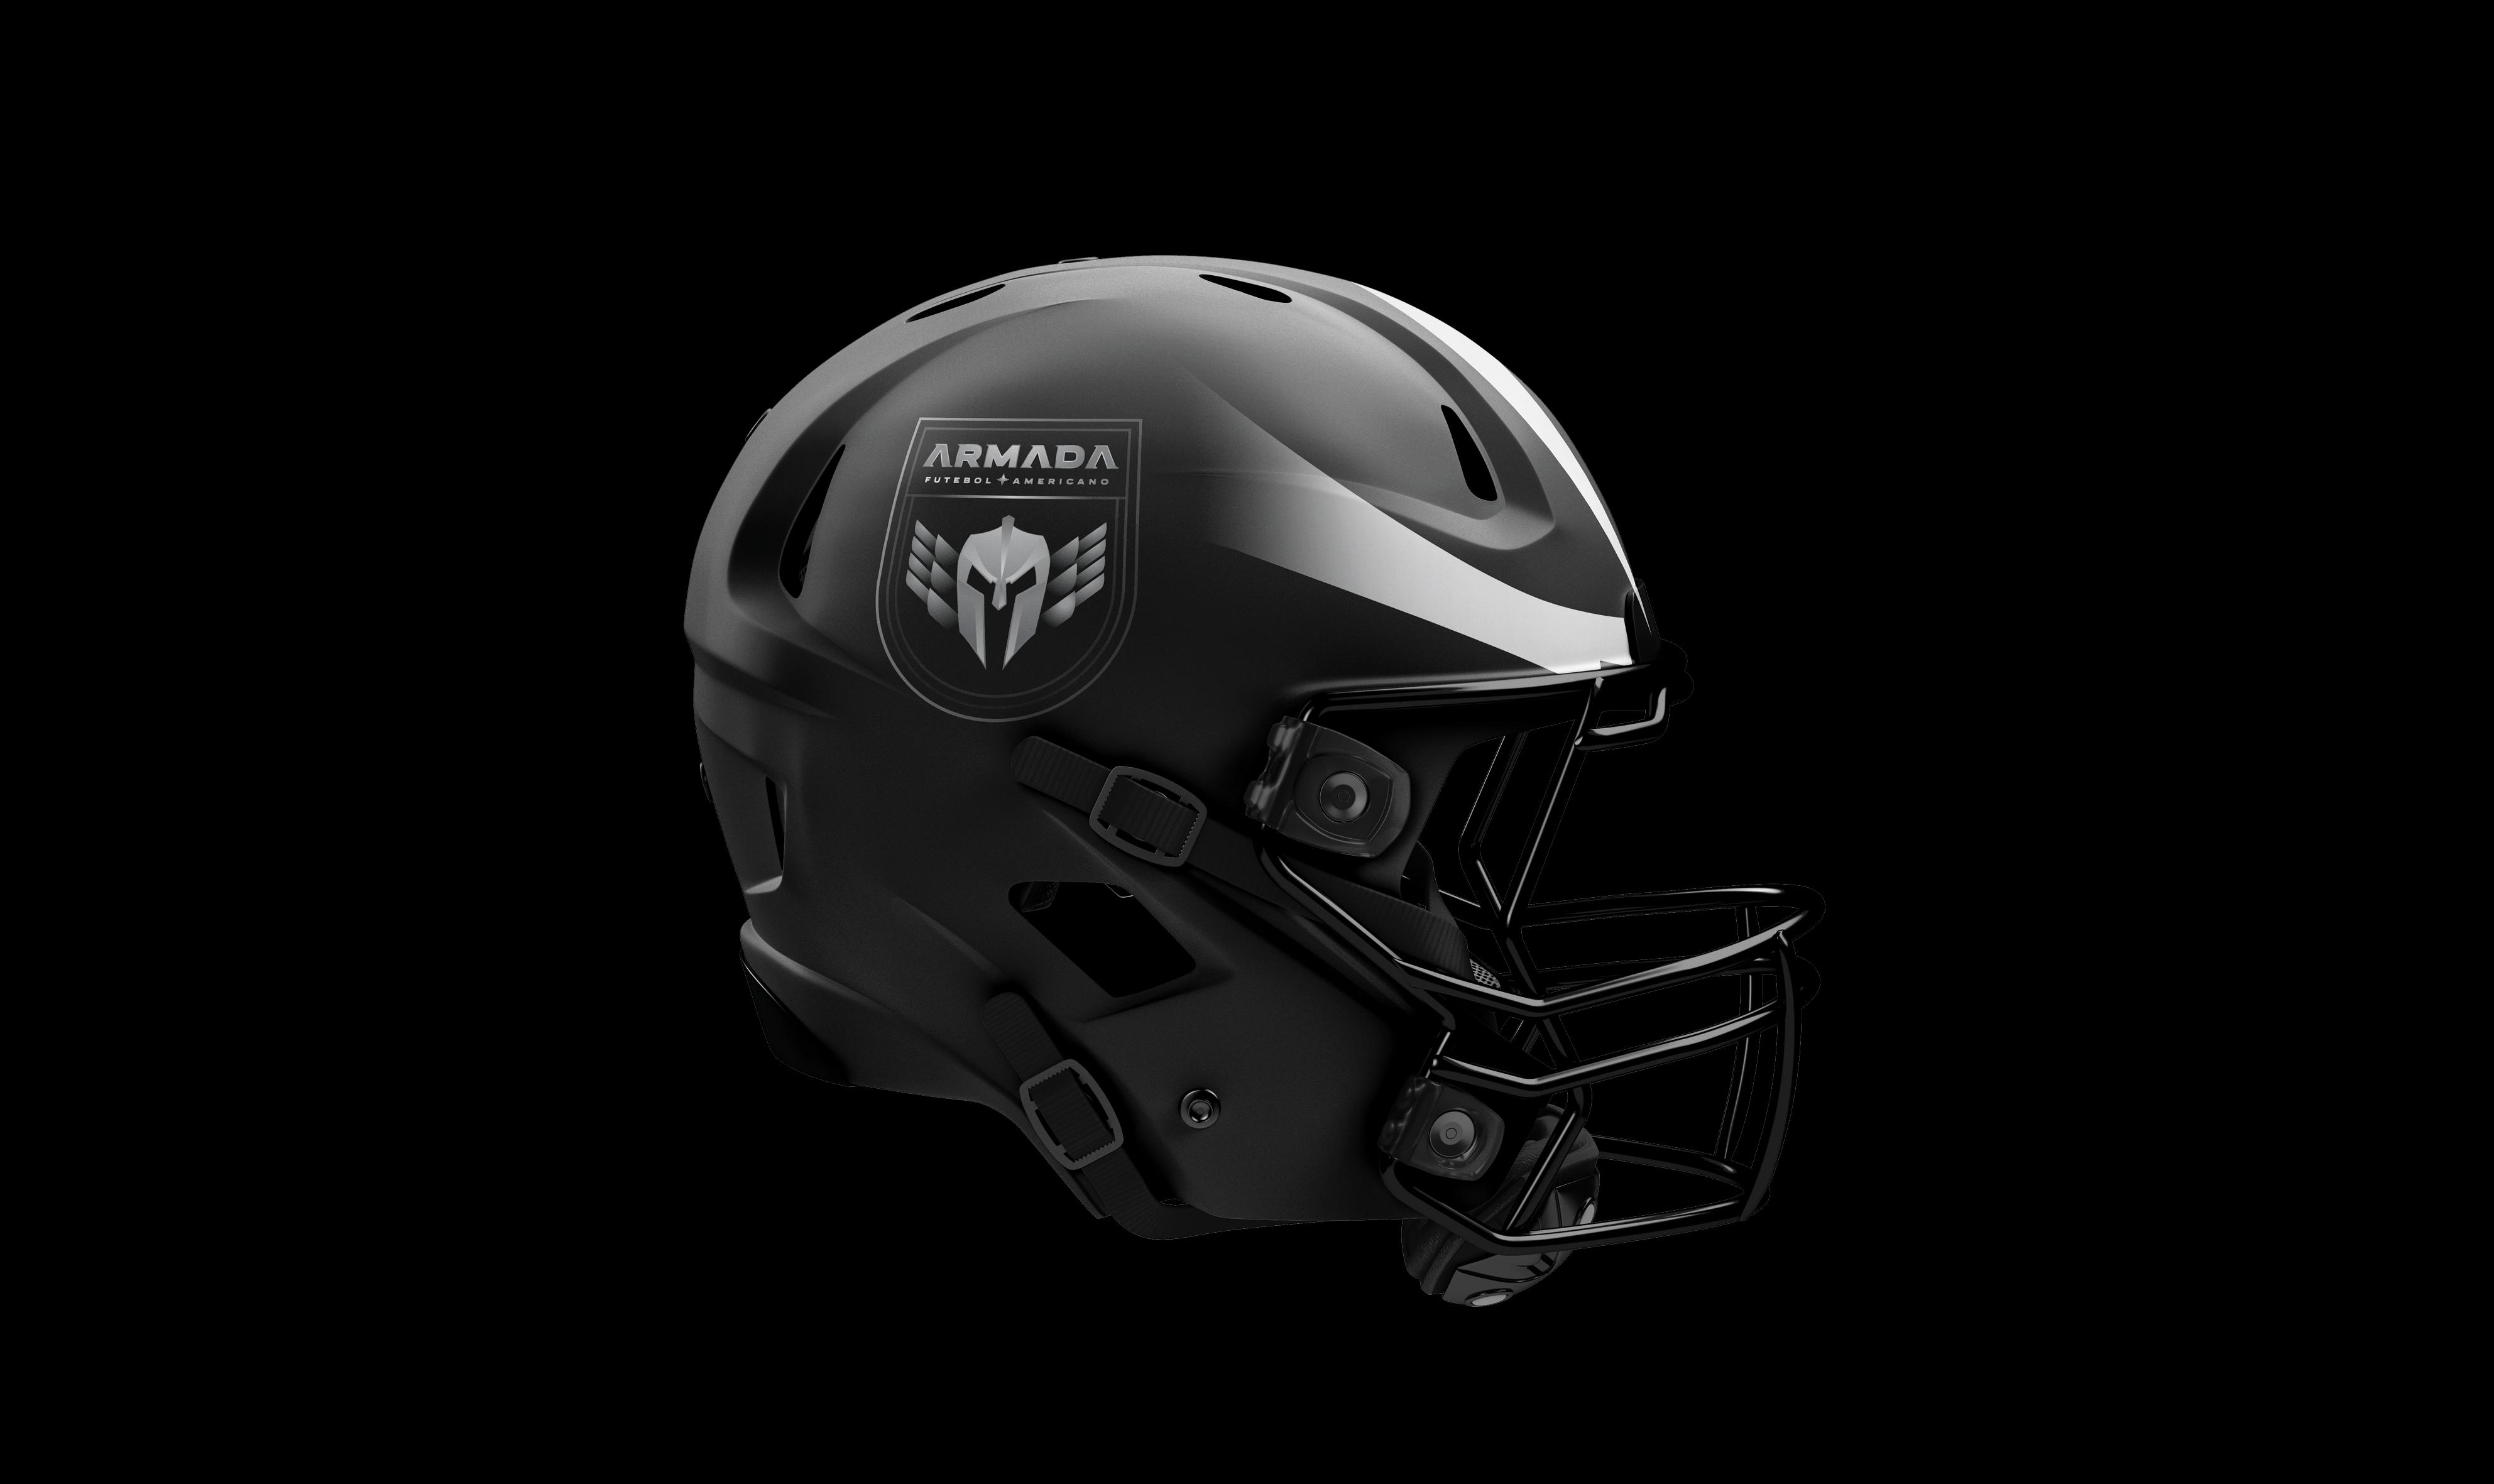 201710 Armada Futebol Americano - Projeto desenvolvido por Nacione35